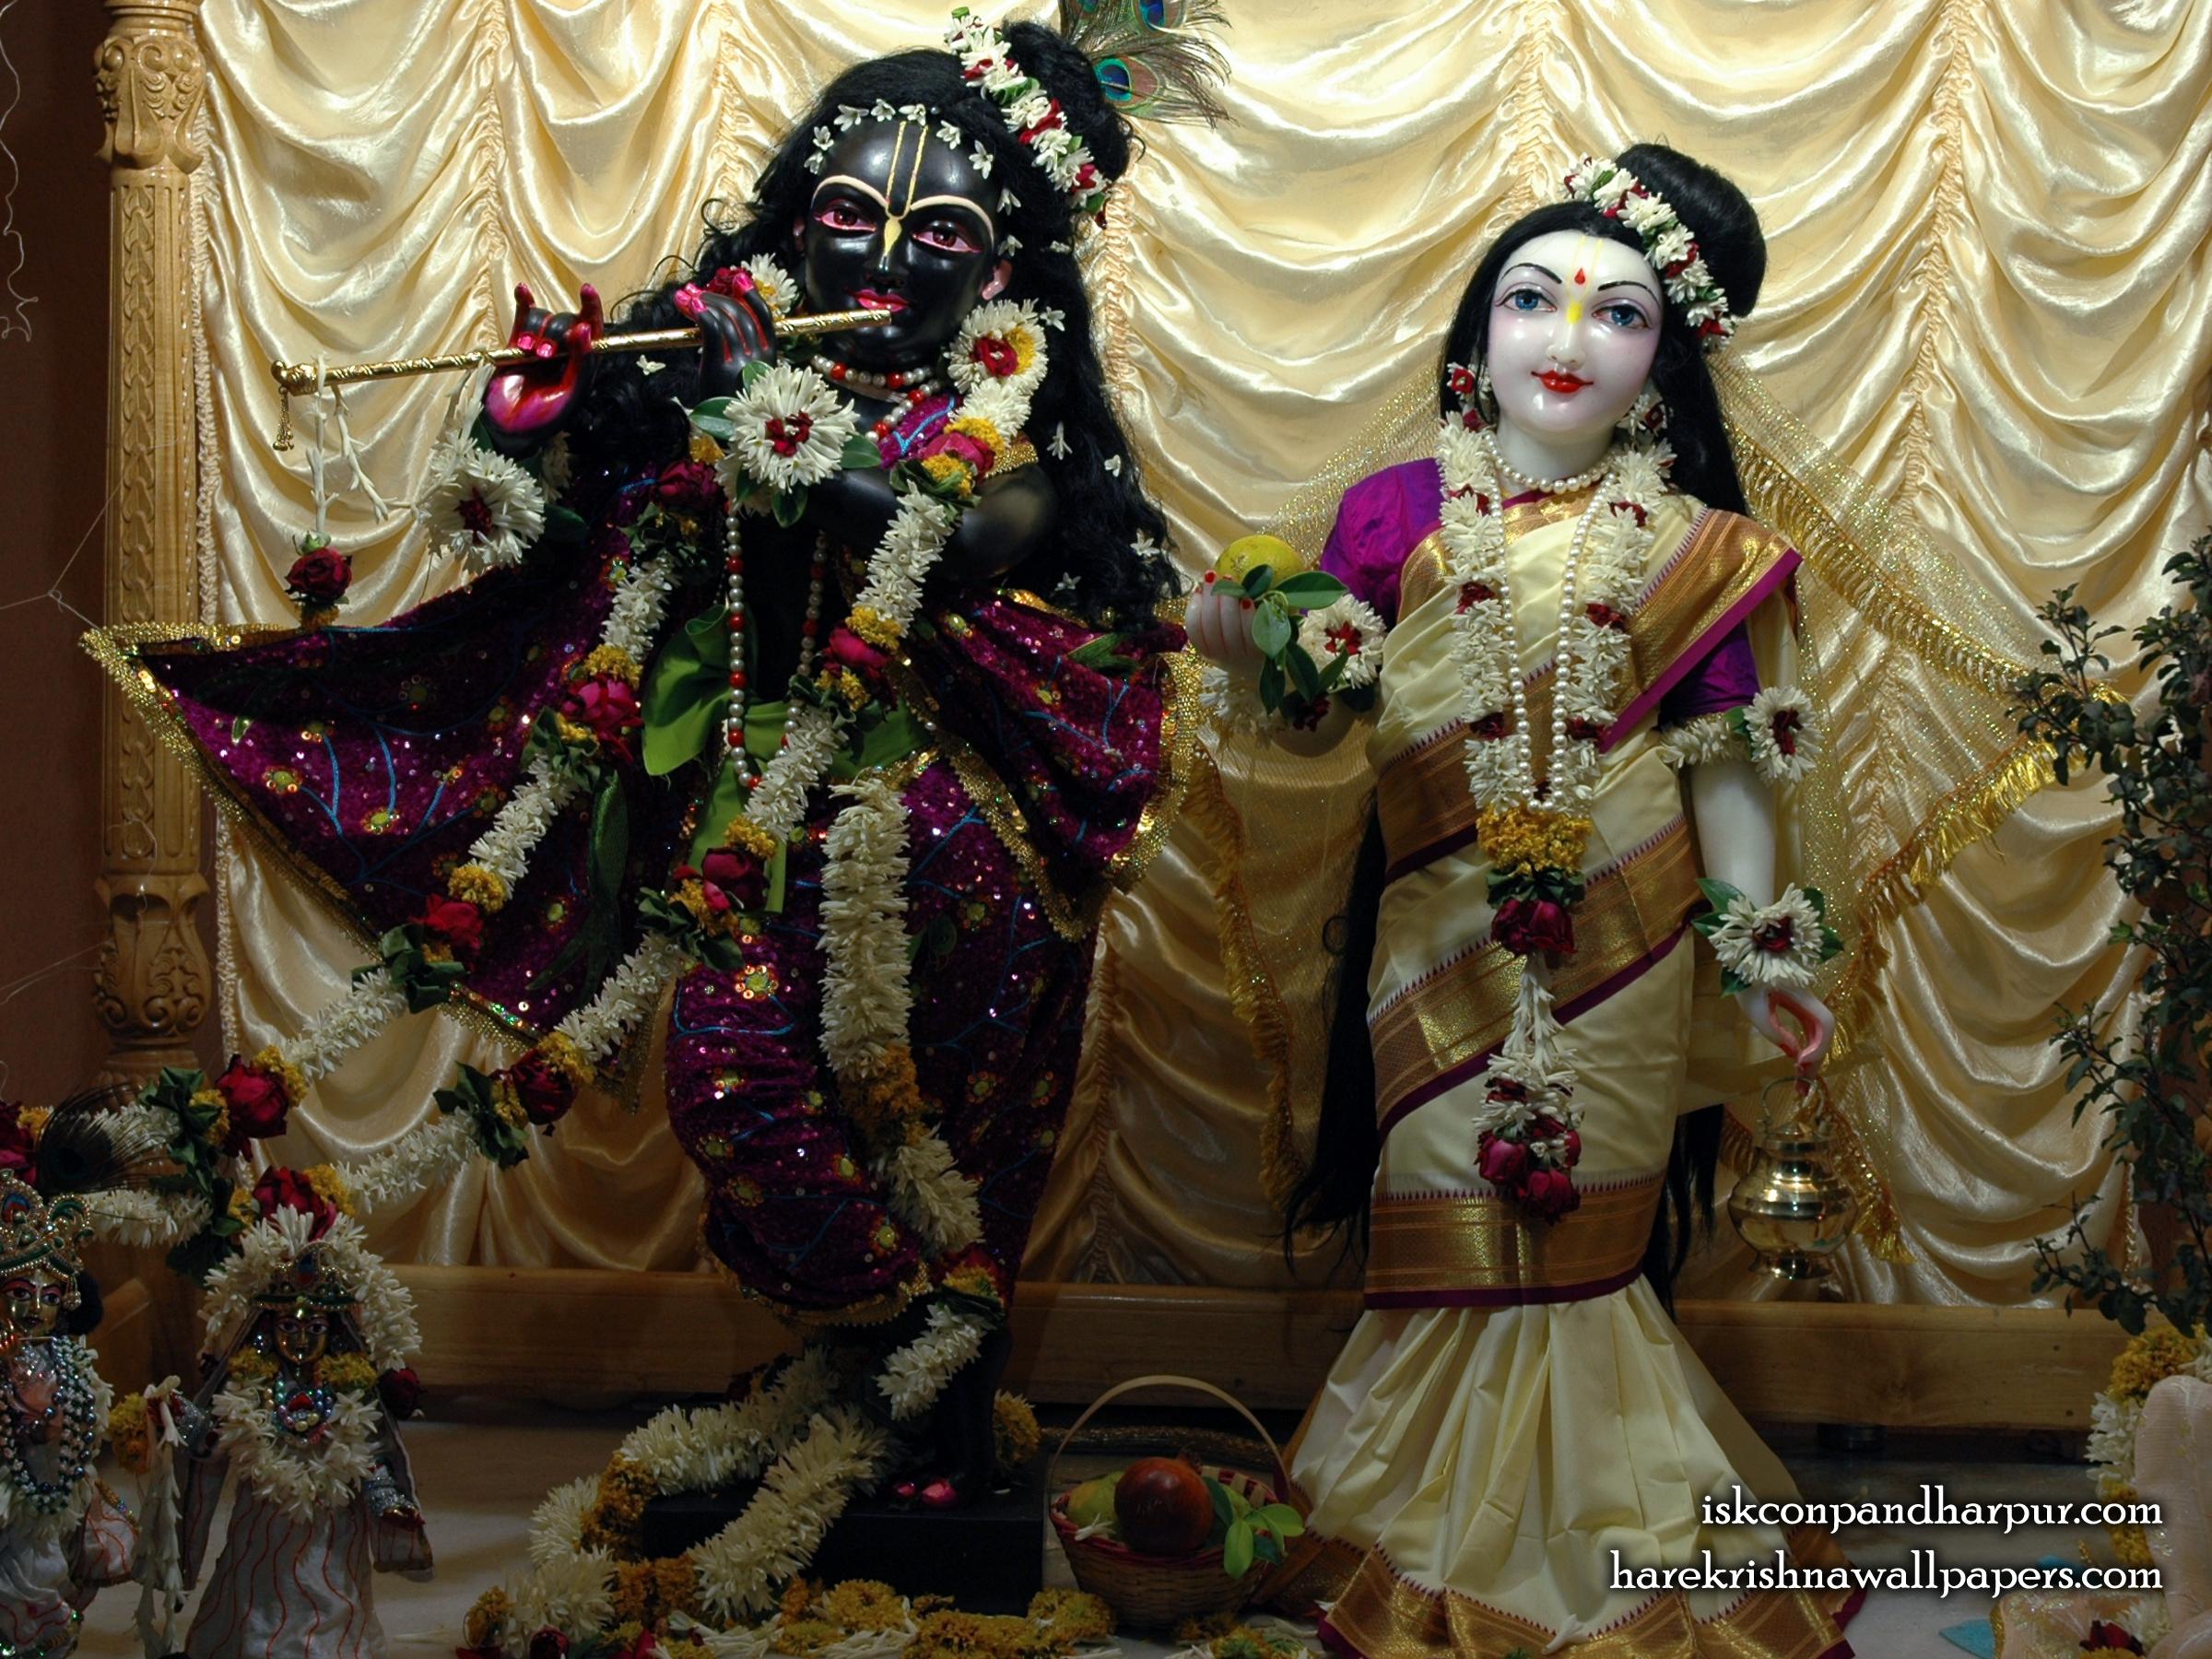 Sri Sri Radha Pandharinath Wallpaper (001) Size 2400x1800 Download